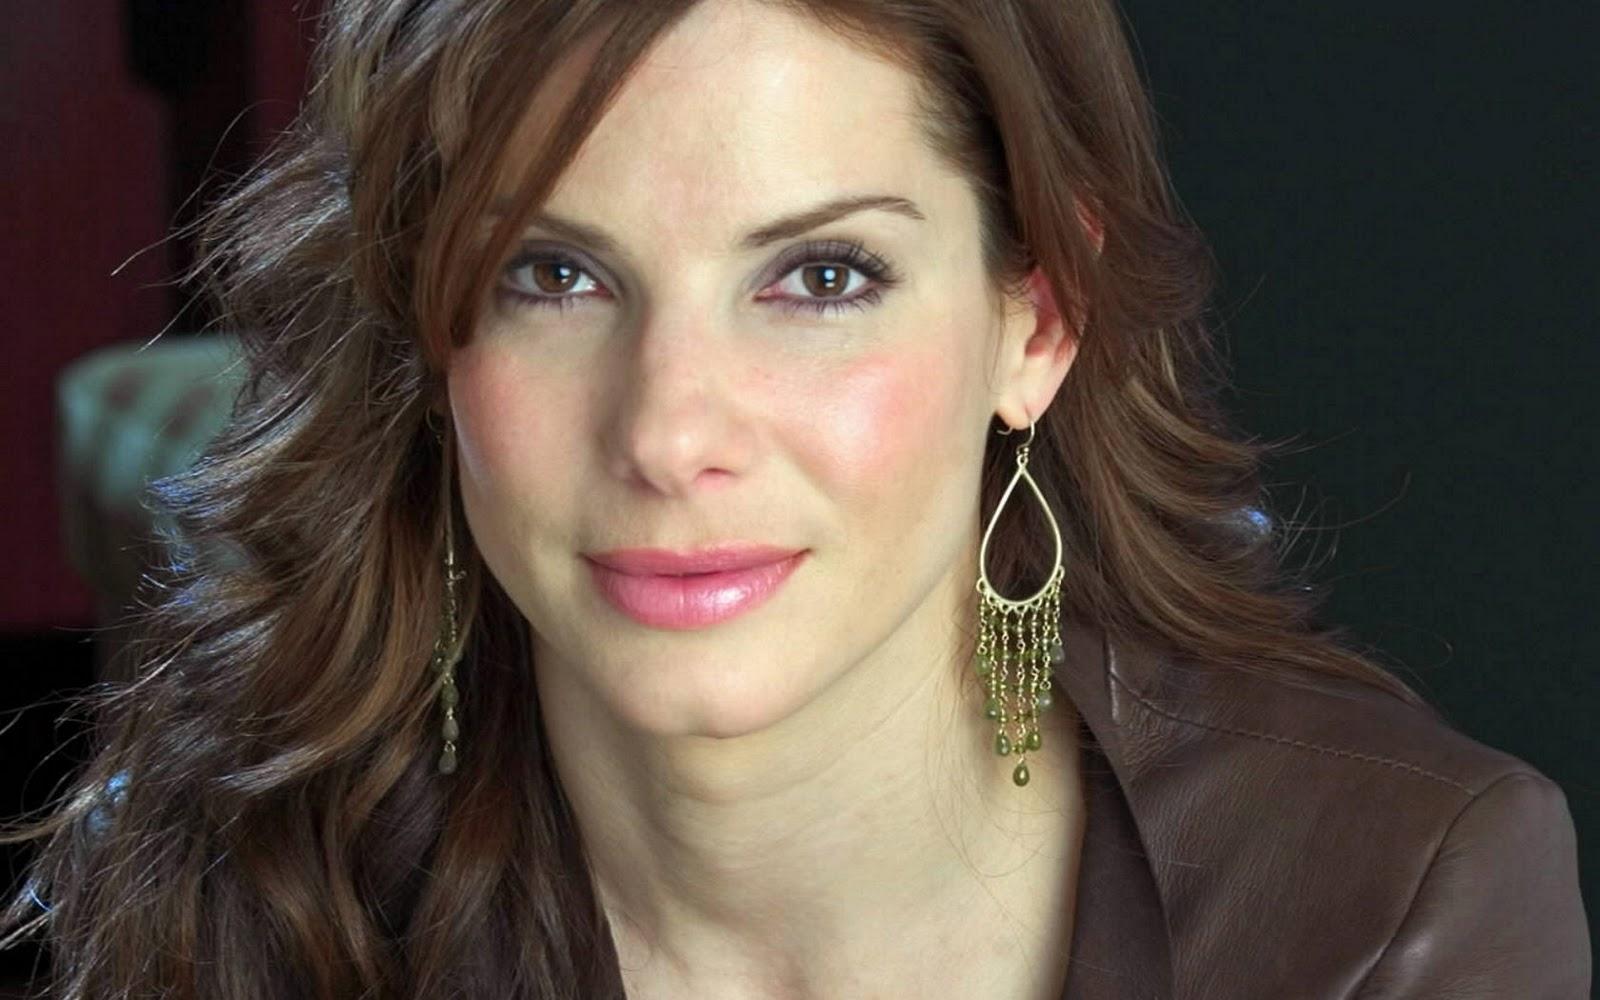 photo Sandra Bullock telechargement gratuit